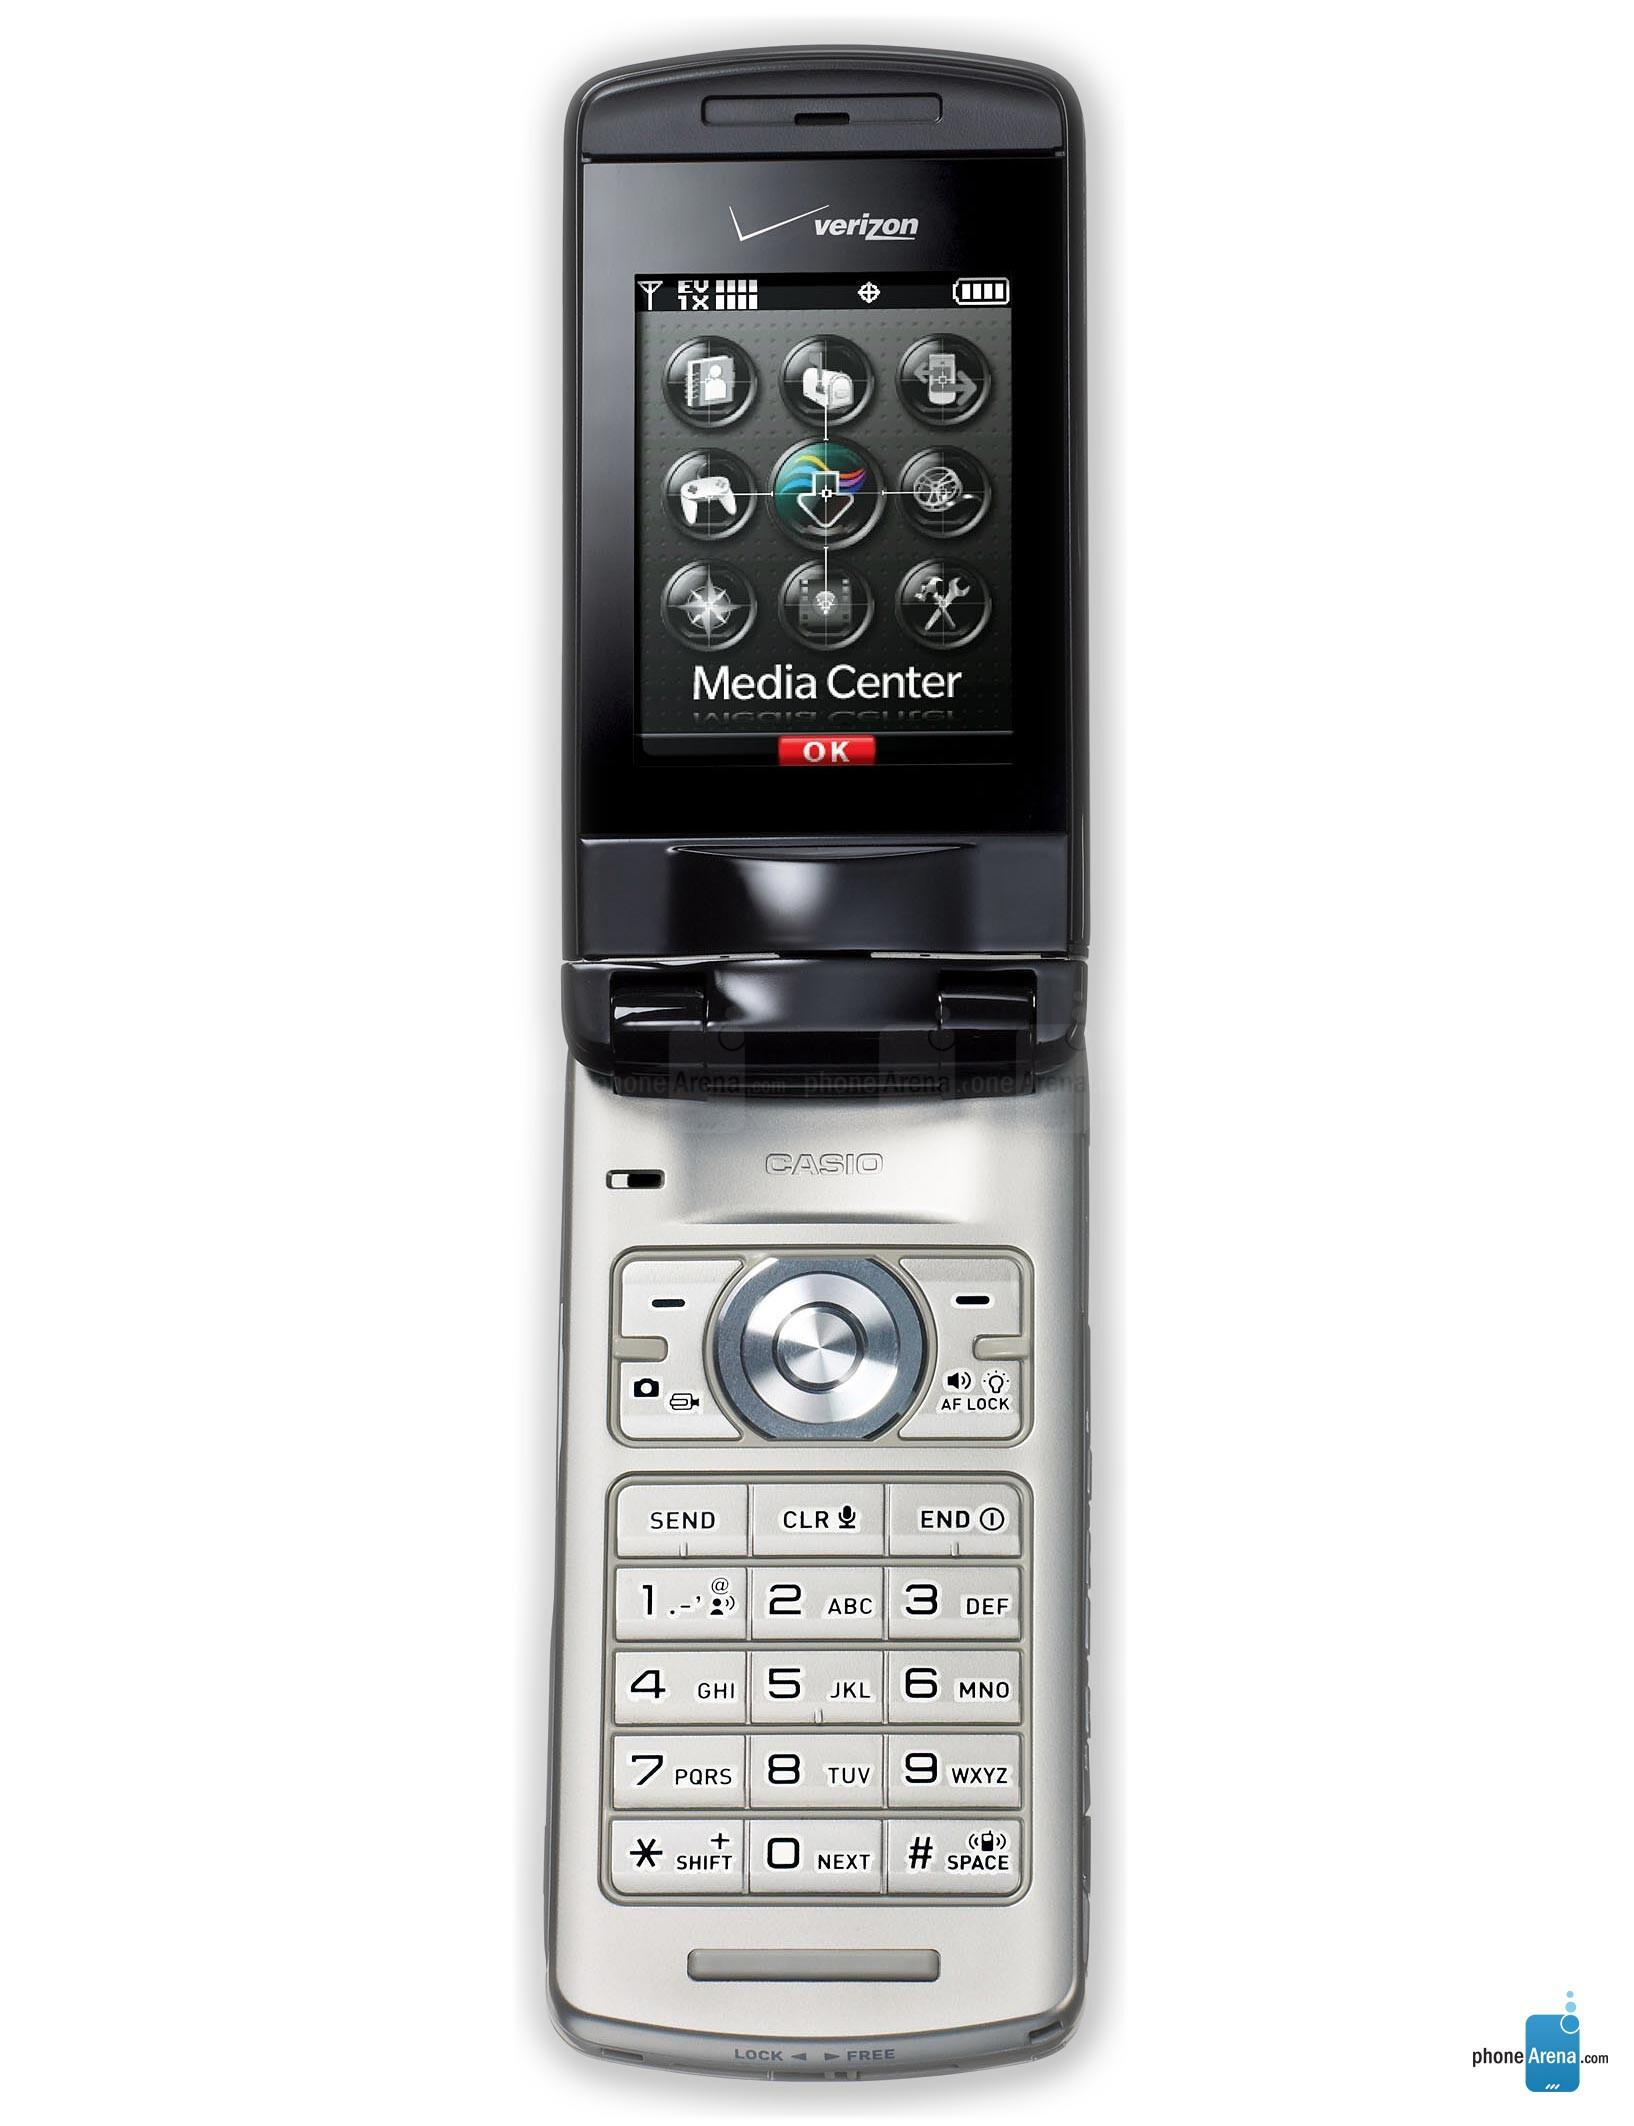 Verizon Wireless Casio Exilim specs